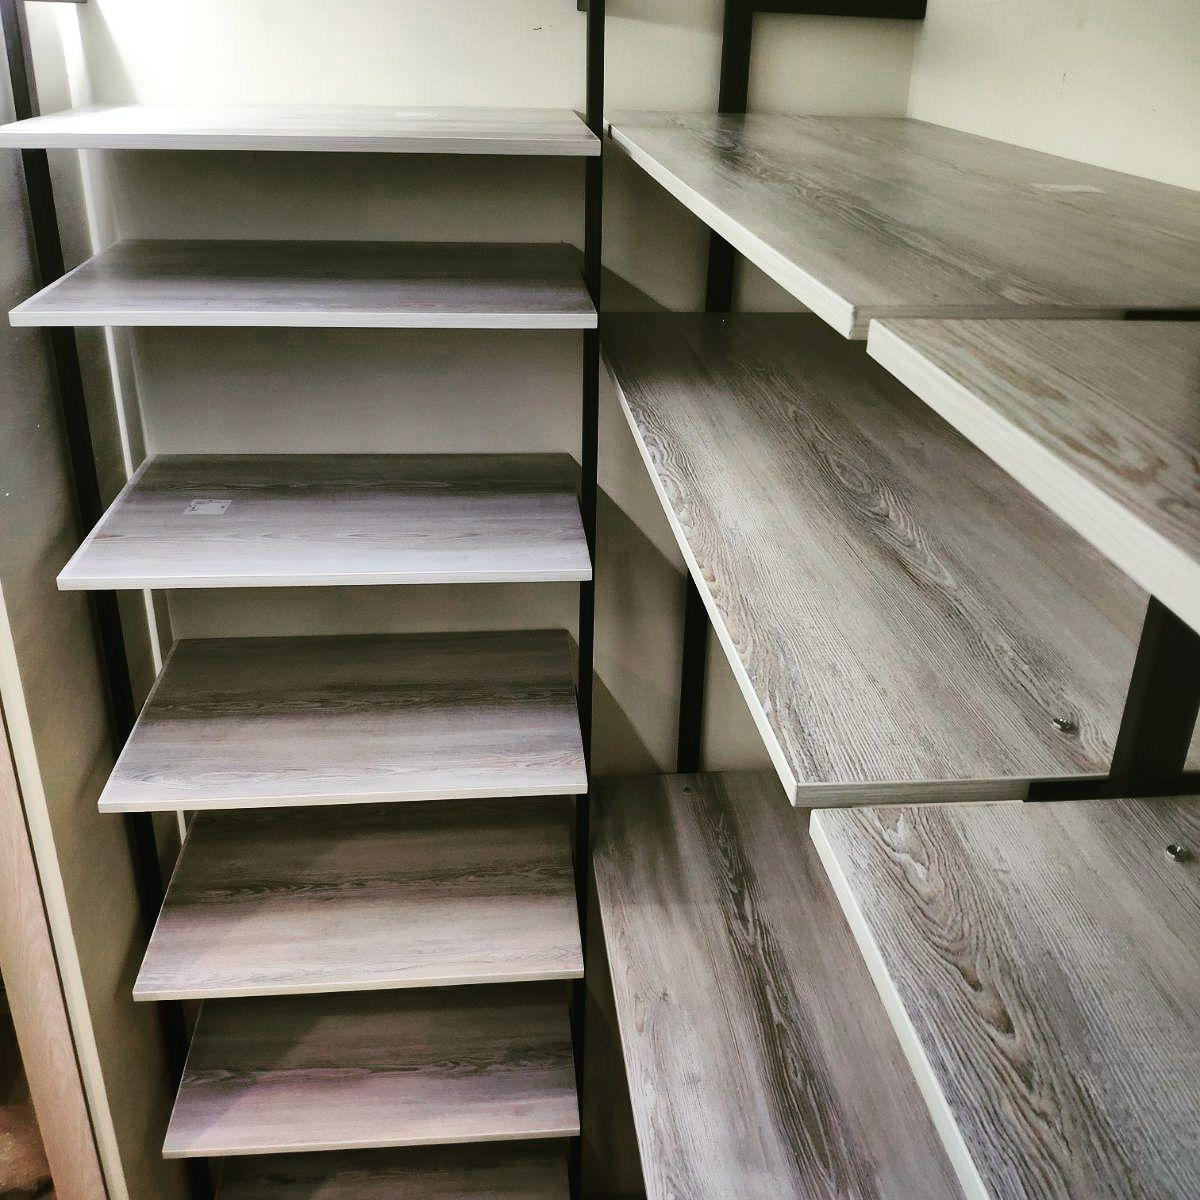 Фото Модульная гардеробная система , гардероб, гардеробная комната 1